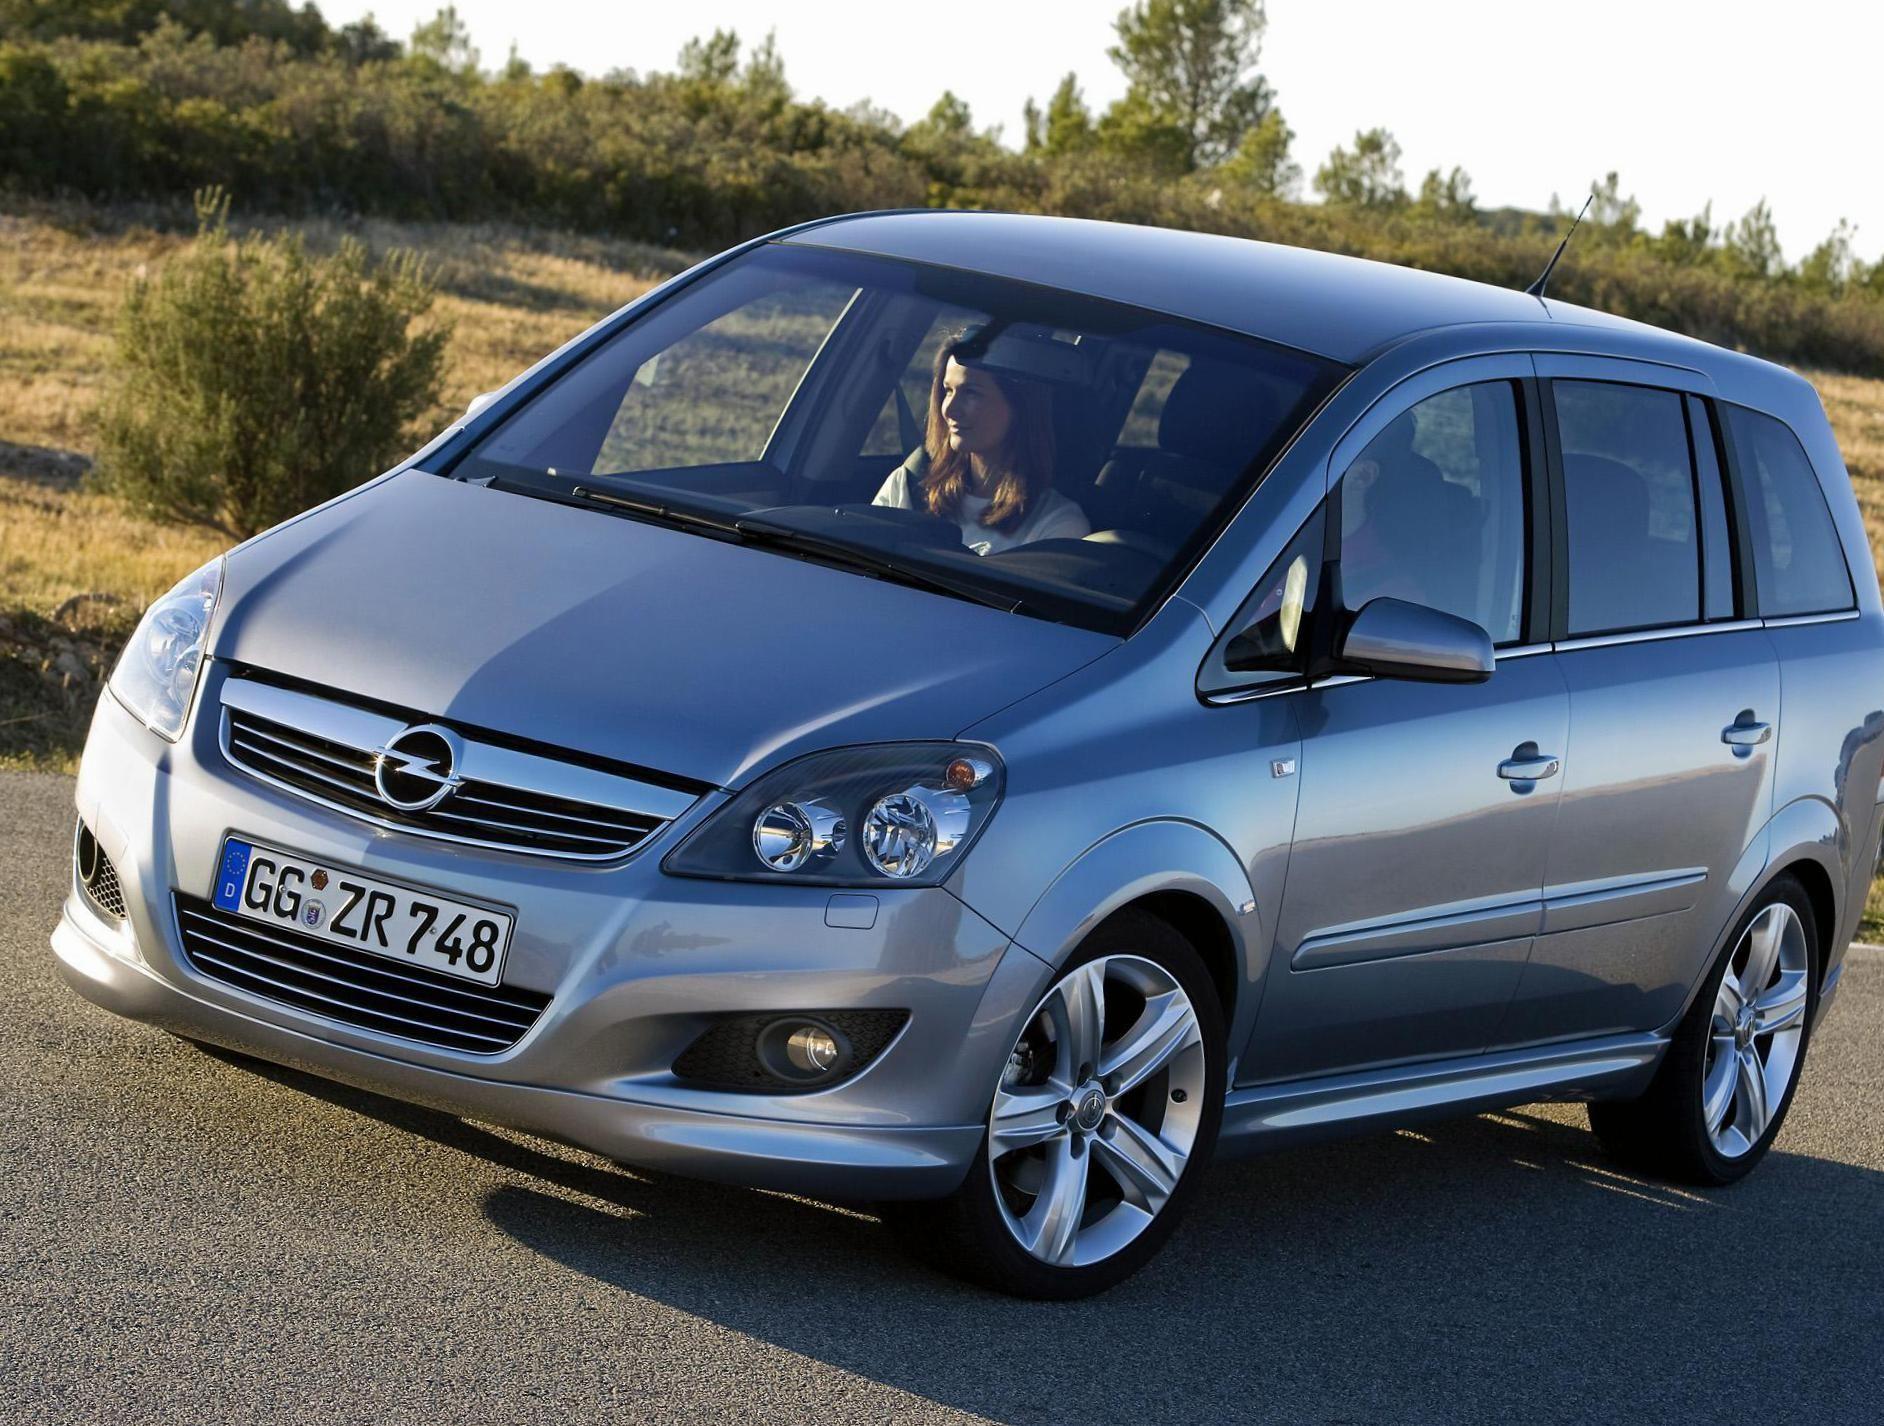 Opel Zafira B Photos And Specs Photo Zafira B Opel Model And 21 Perfect Photos Of Opel Zafira B Opel Model Image